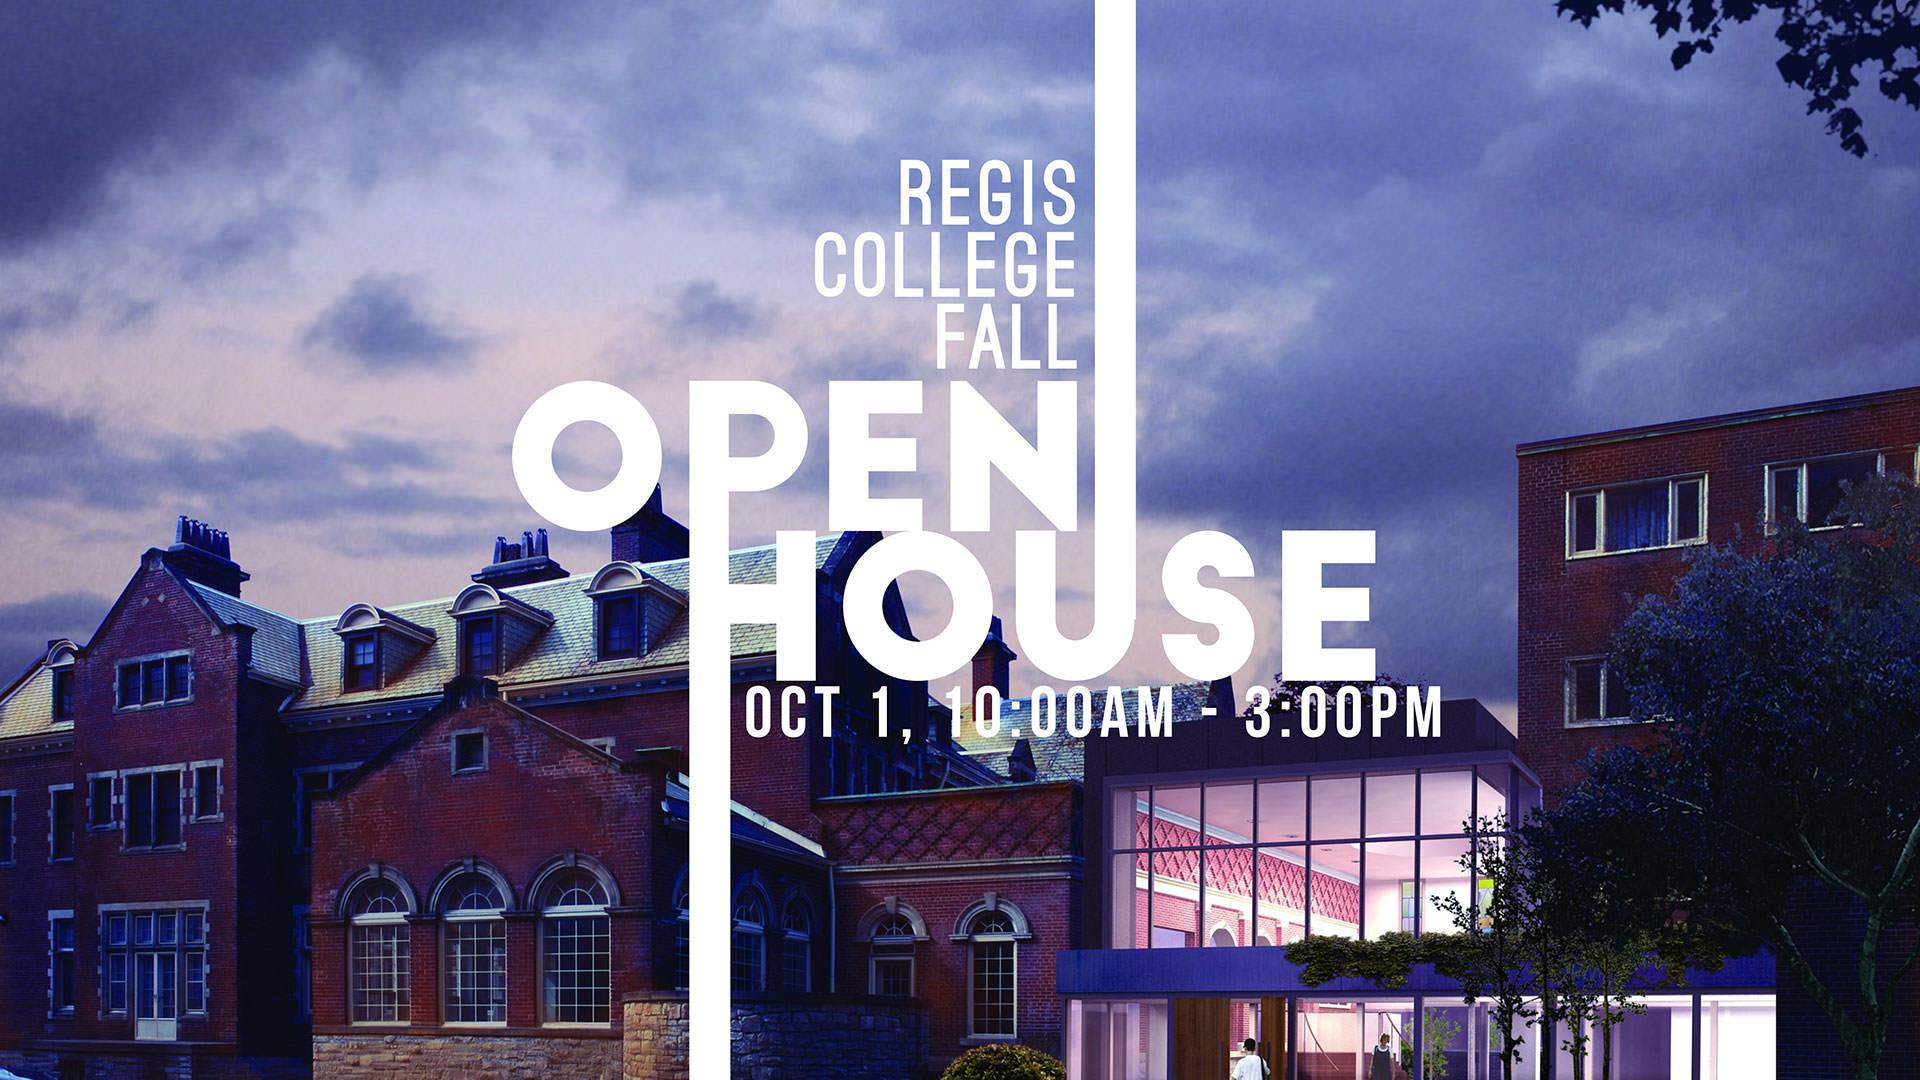 Open House - Regis College